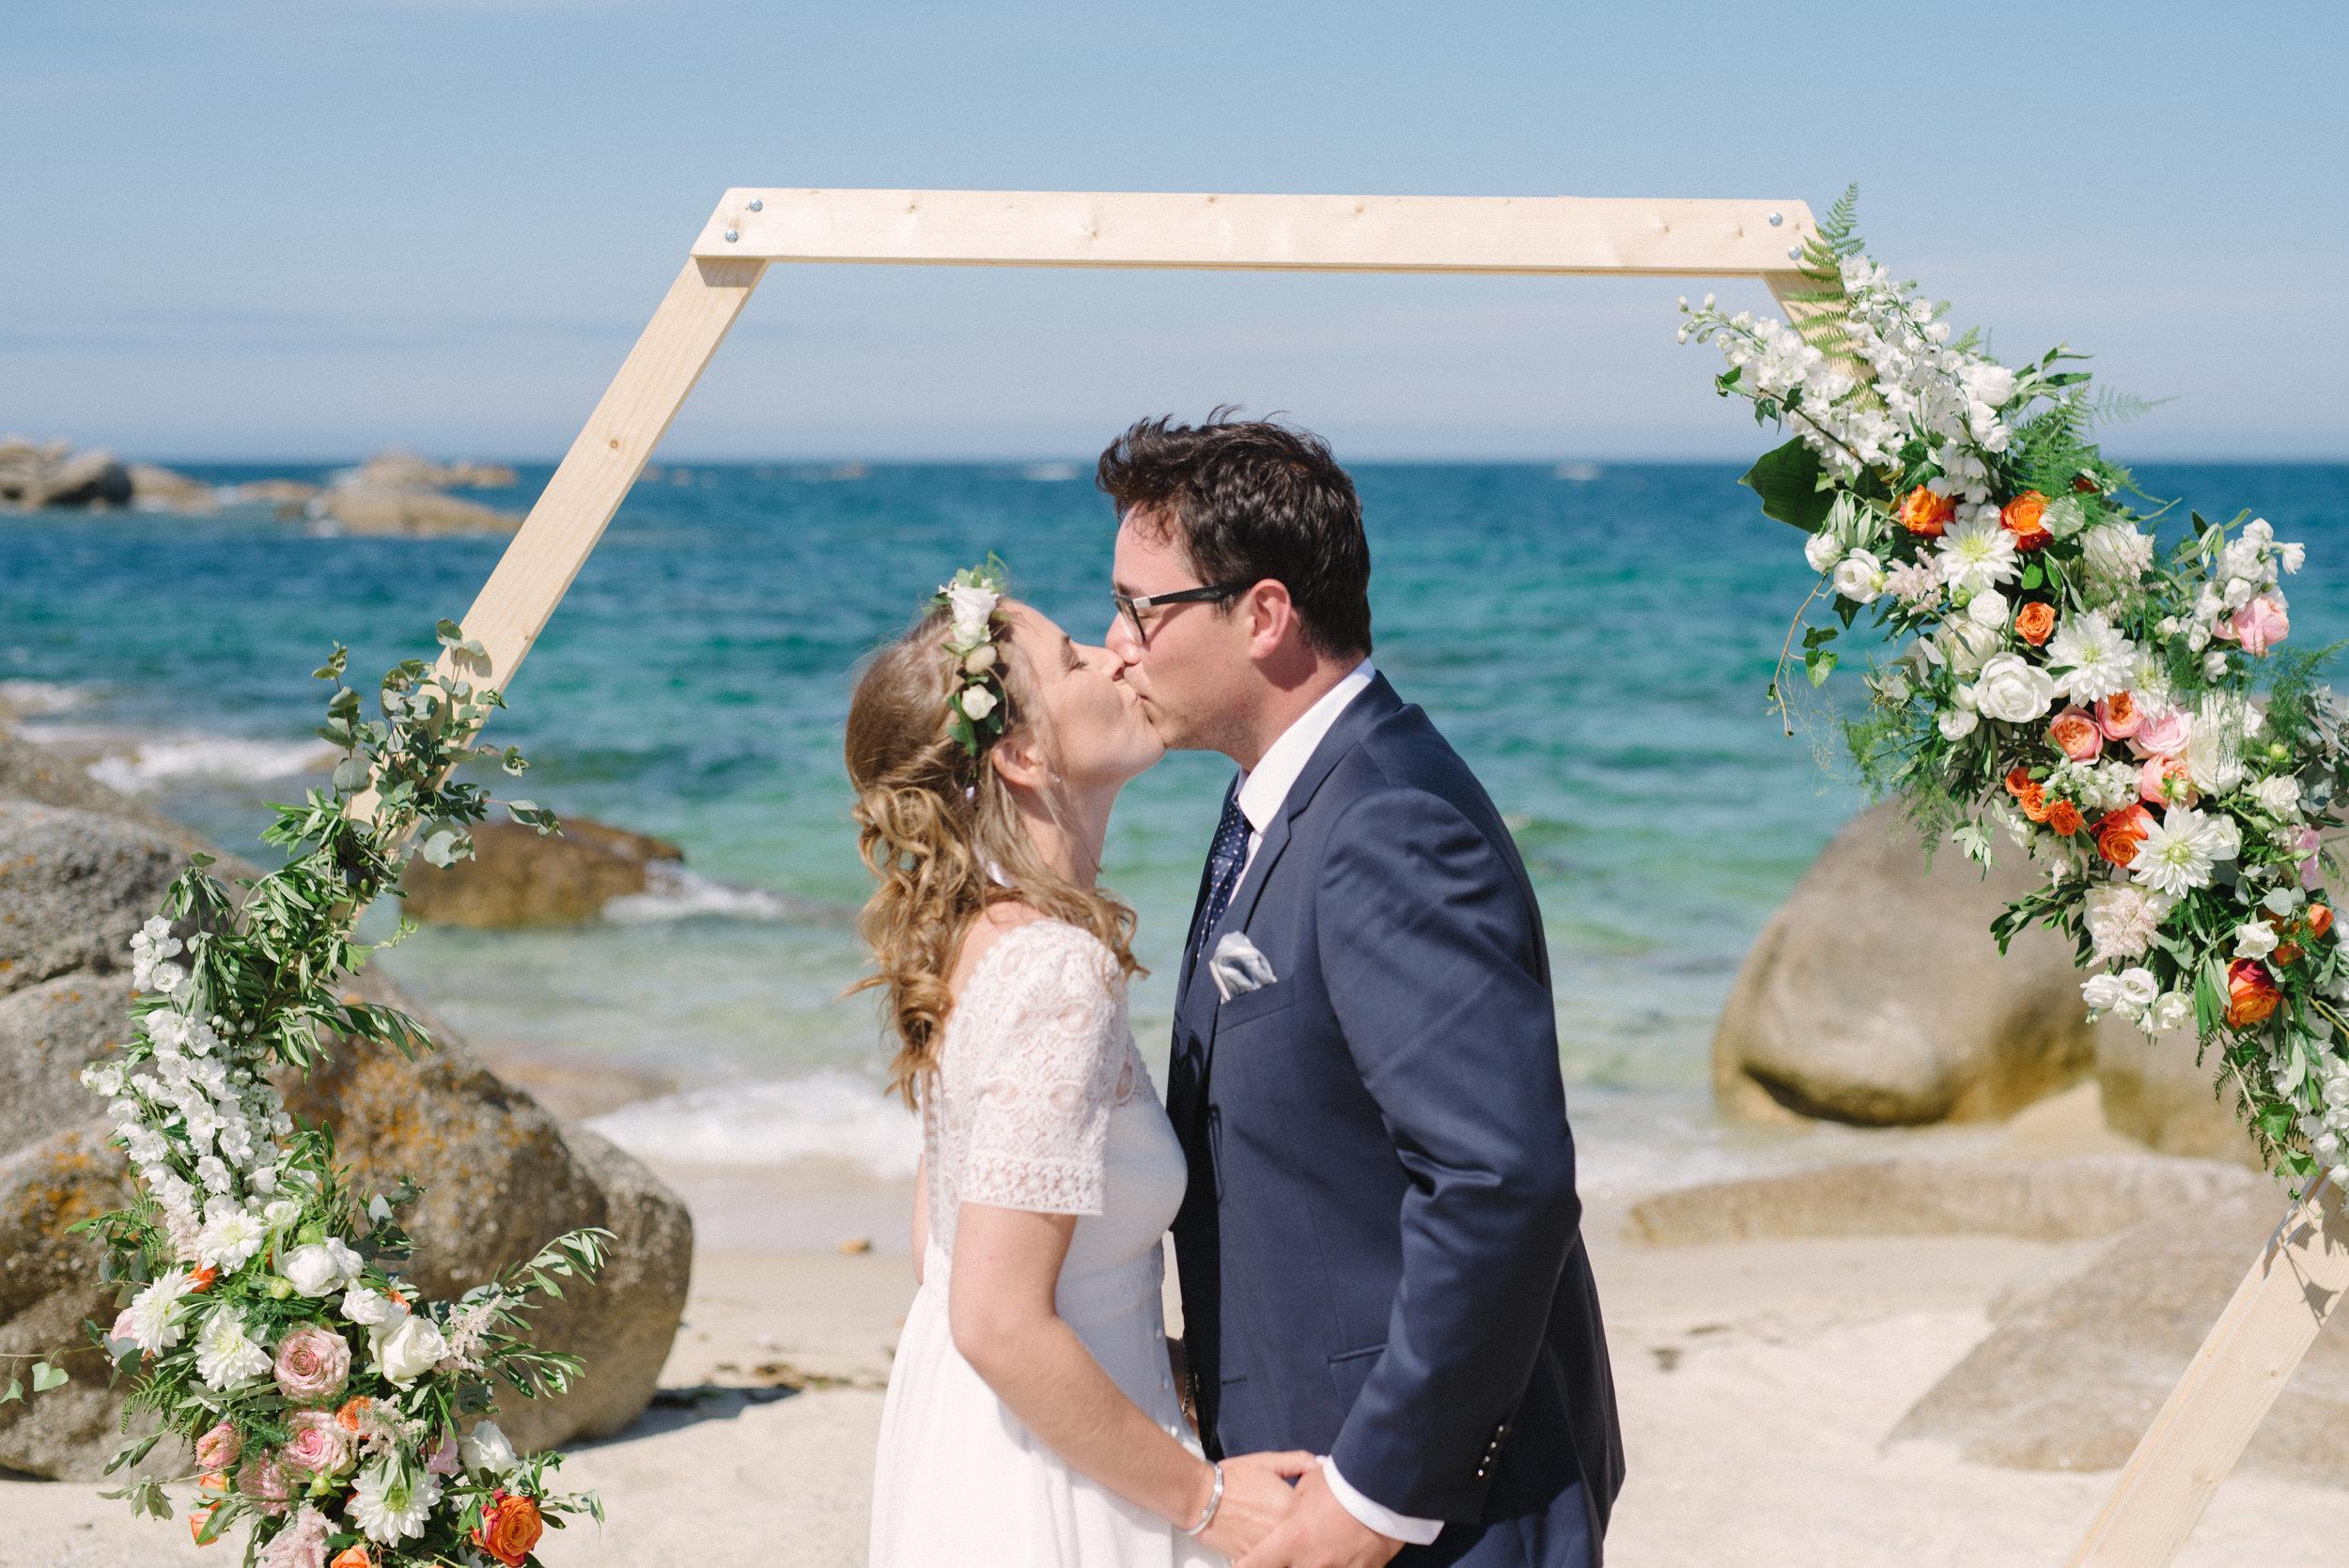 Photographe mariage bretagne rennes nantes Brest